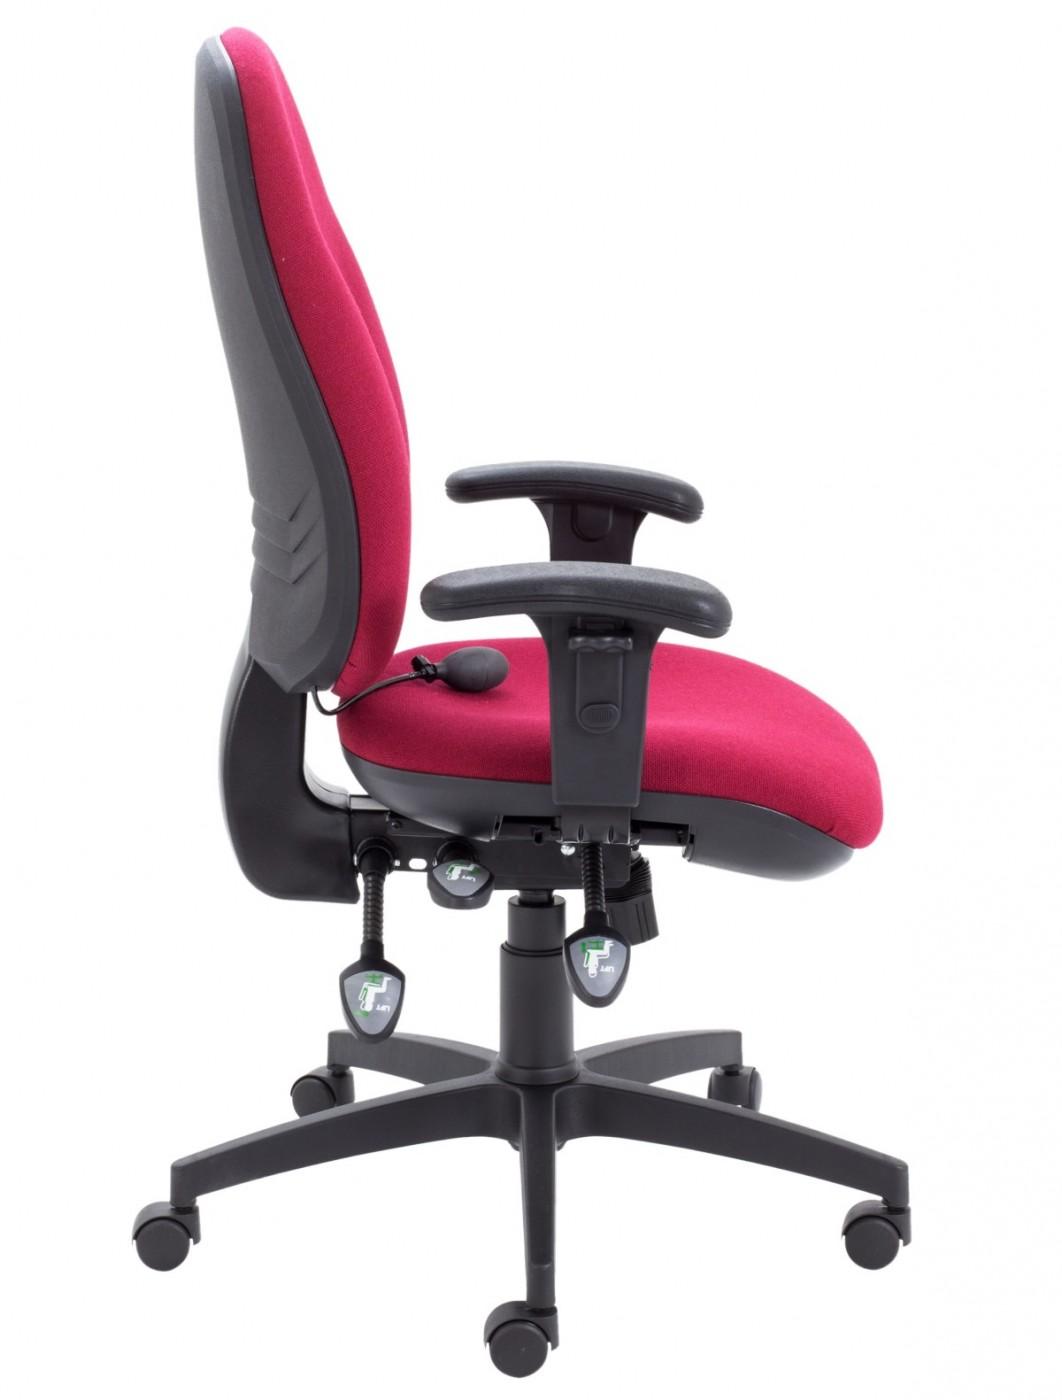 Fabulous Tc Office Concept Maxi Ergo Office Chair Ch0808 In Claret Machost Co Dining Chair Design Ideas Machostcouk